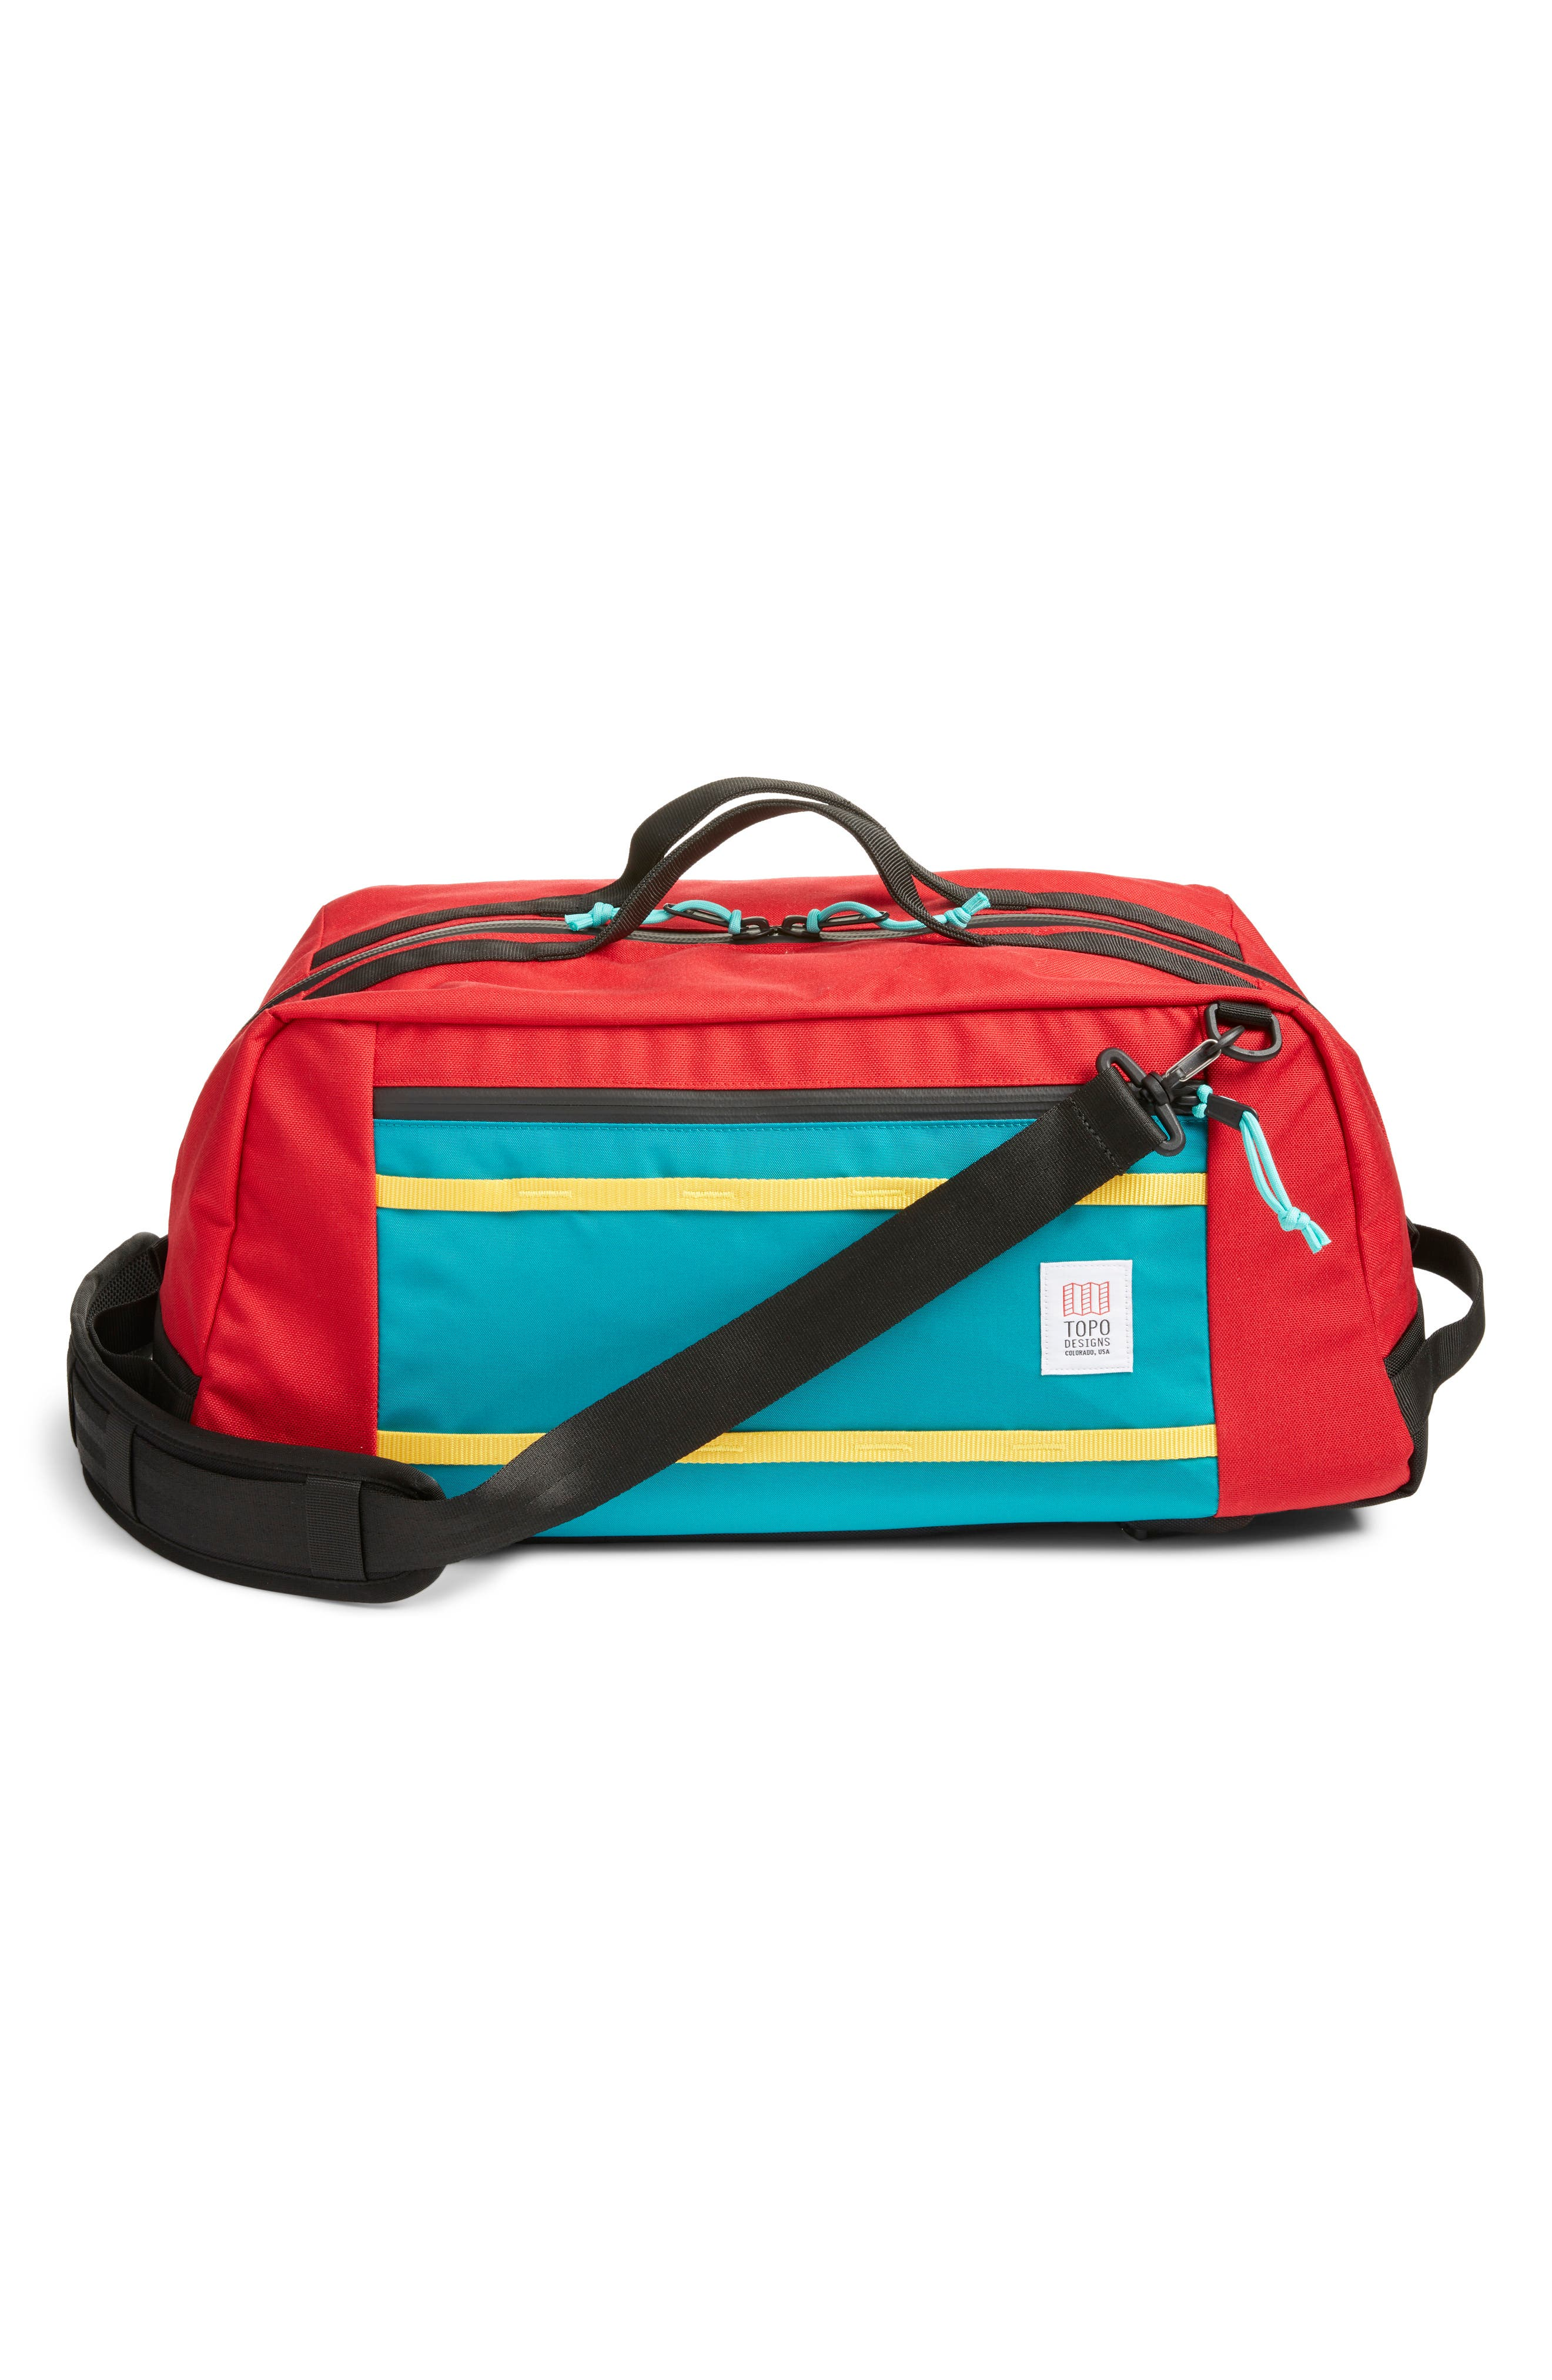 Mountain 40L Convertible Duffel Bag, Main, color, 600